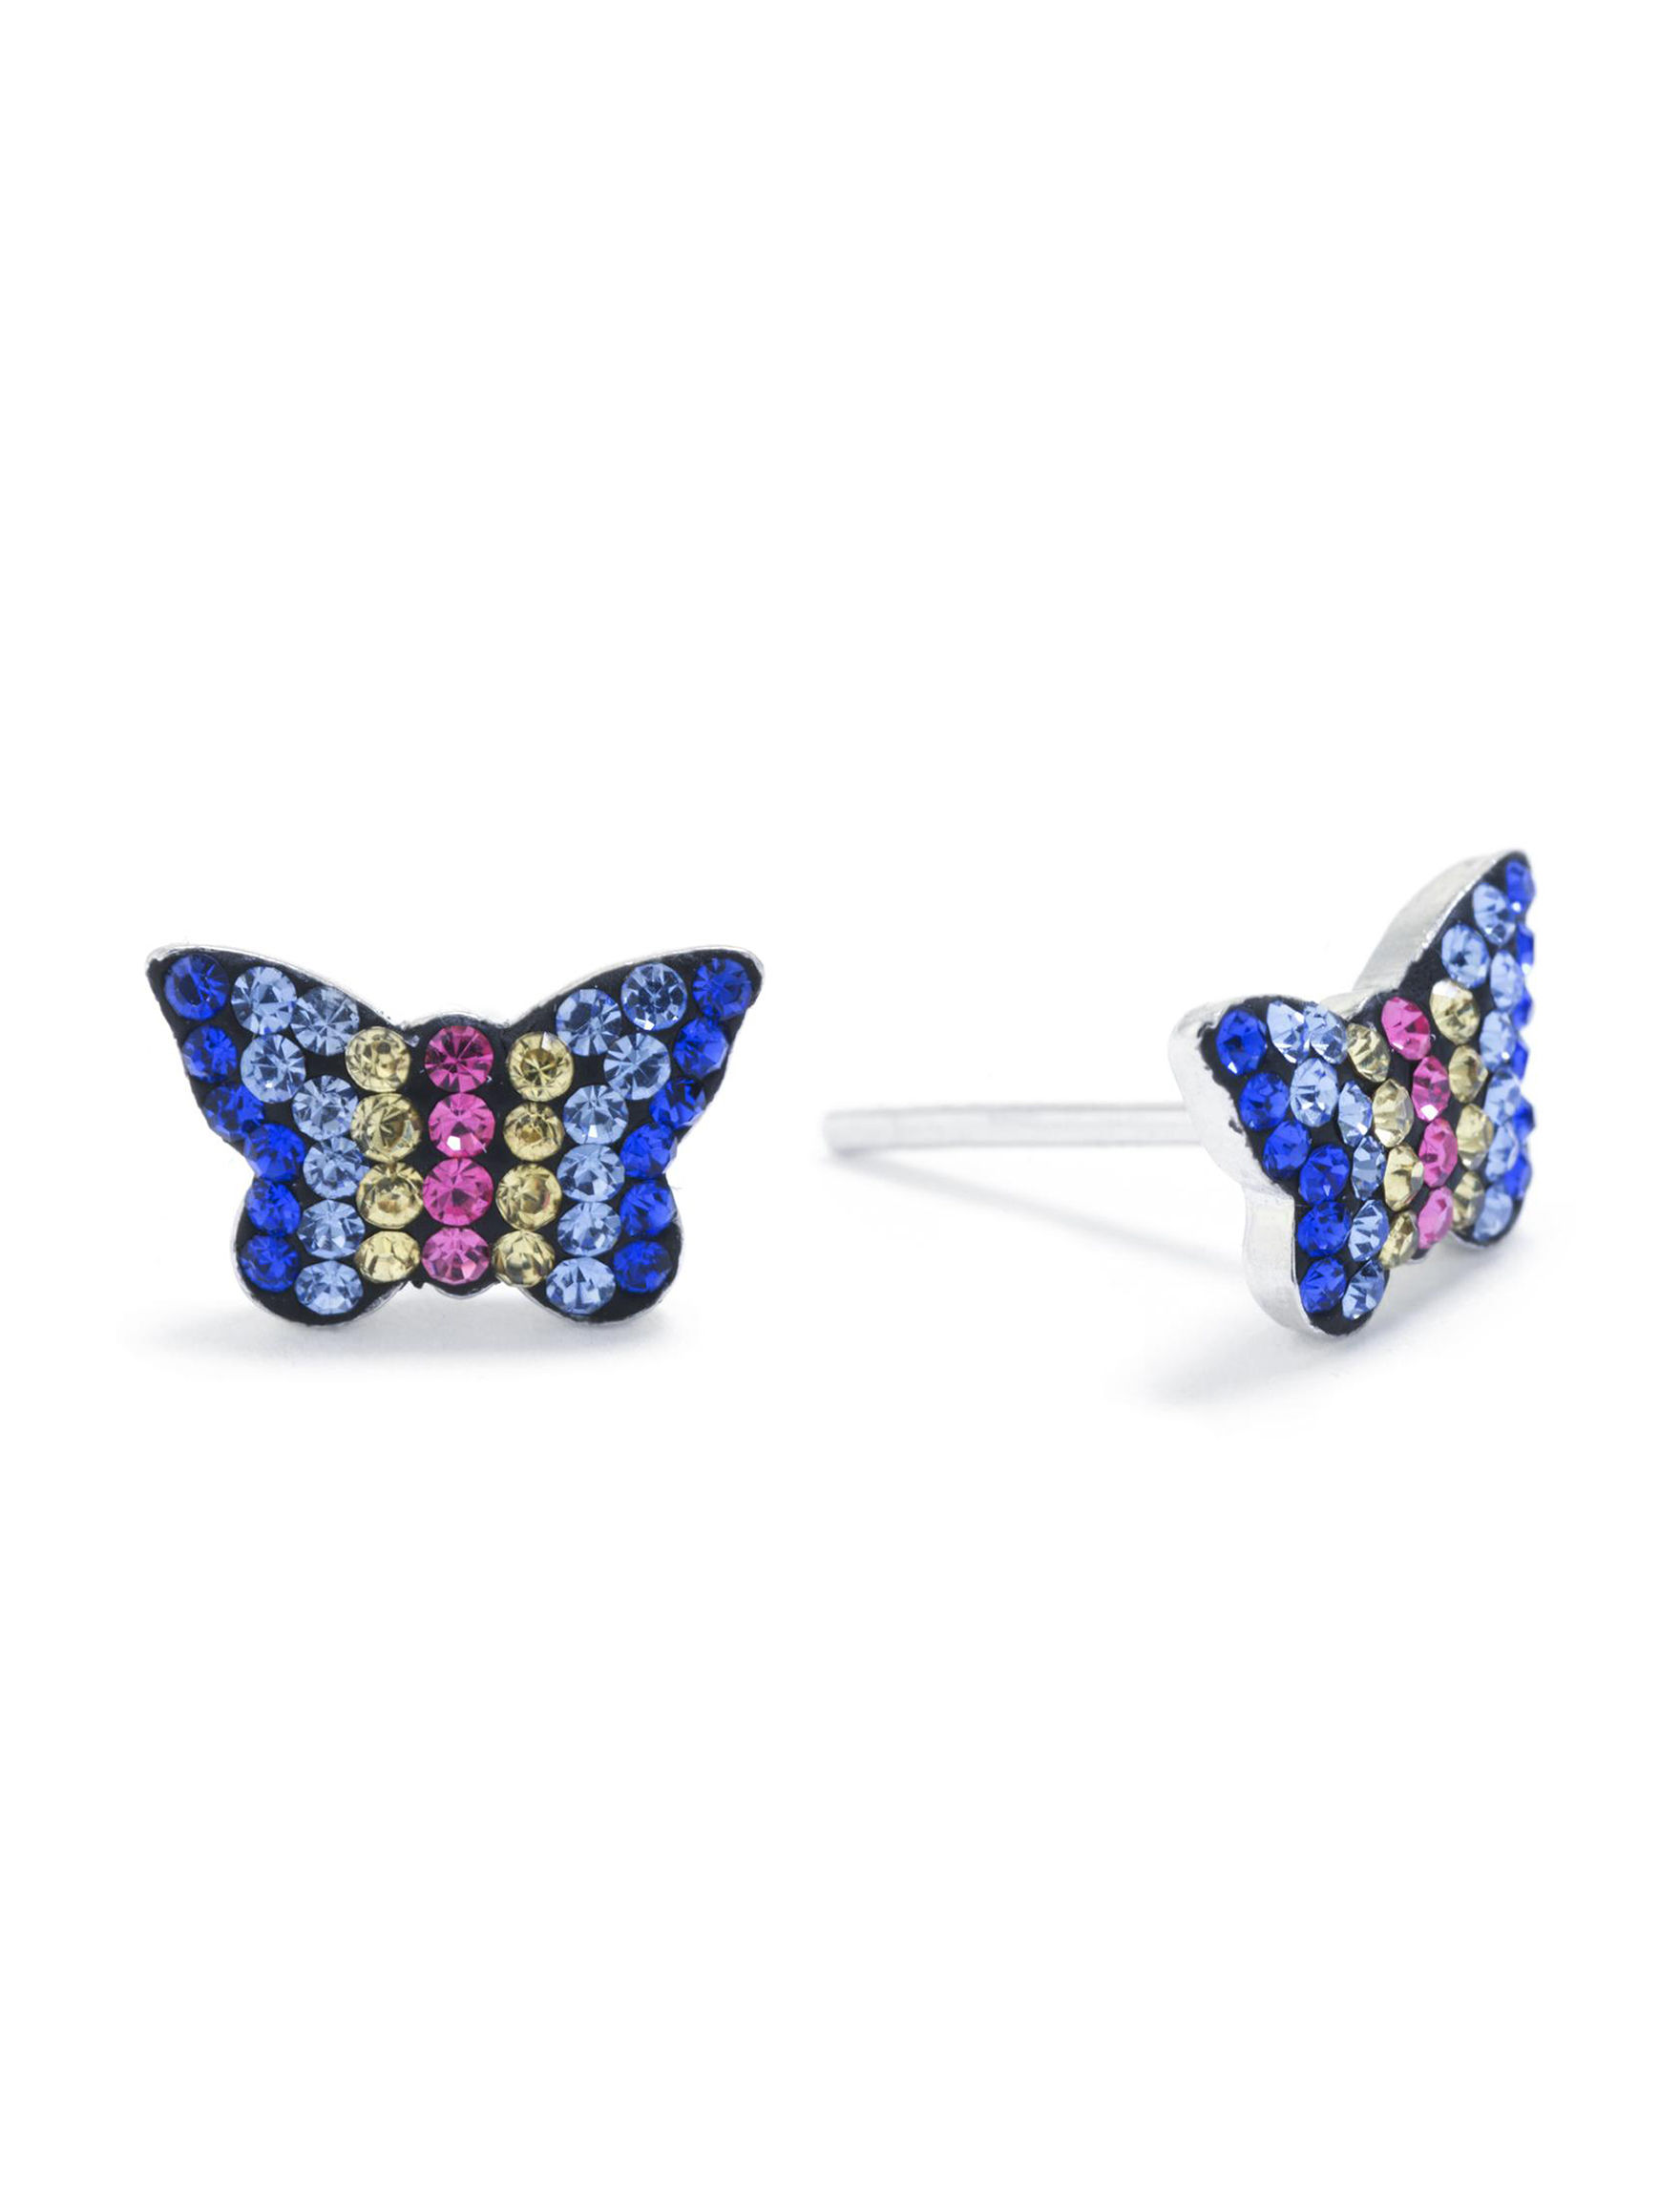 Athra Silver / Multi Studs Earrings Fine Jewelry